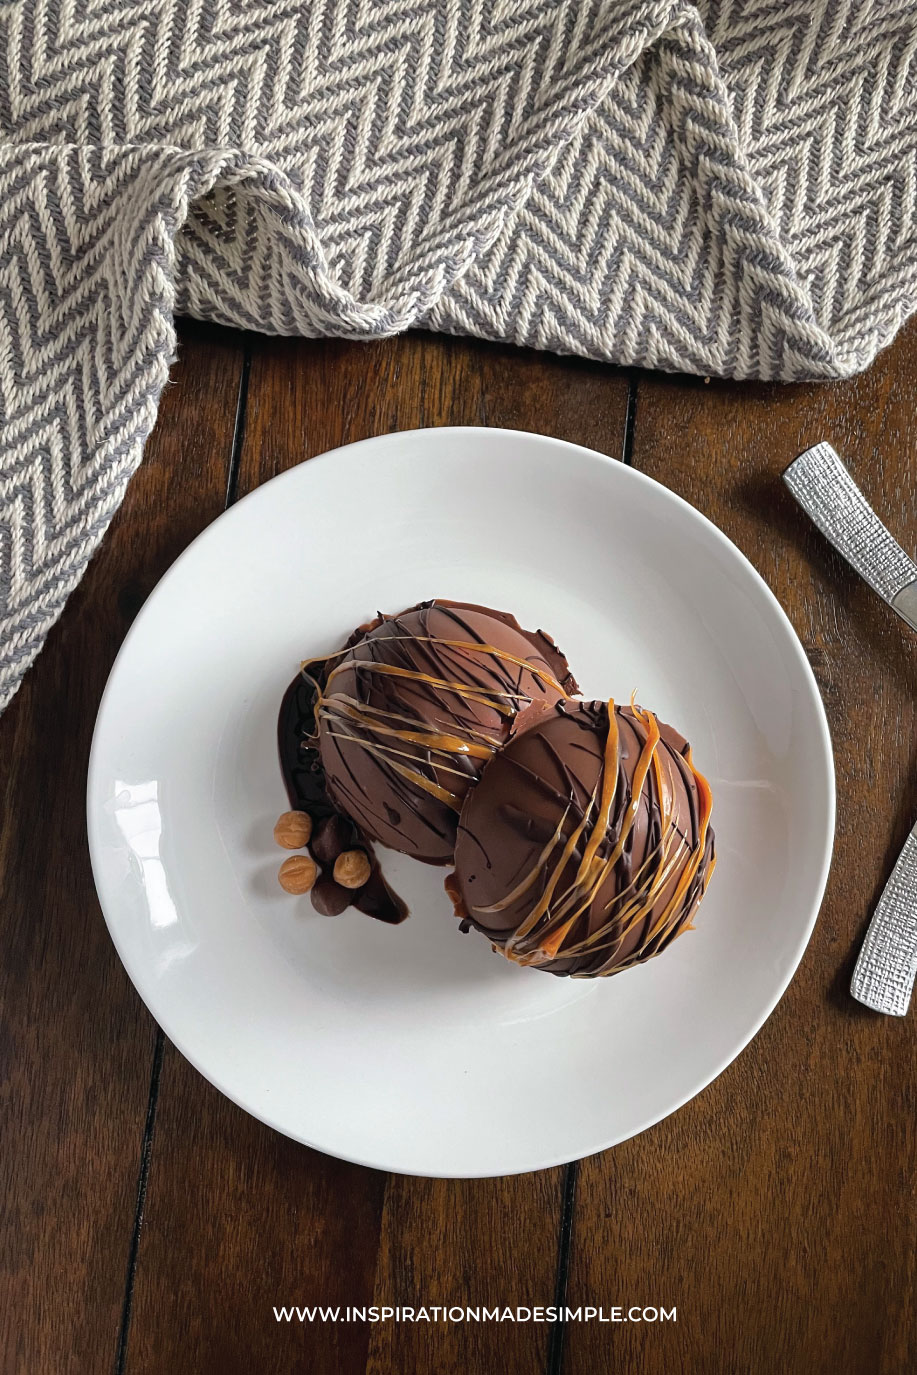 Chocolate and Ice Cream Dome